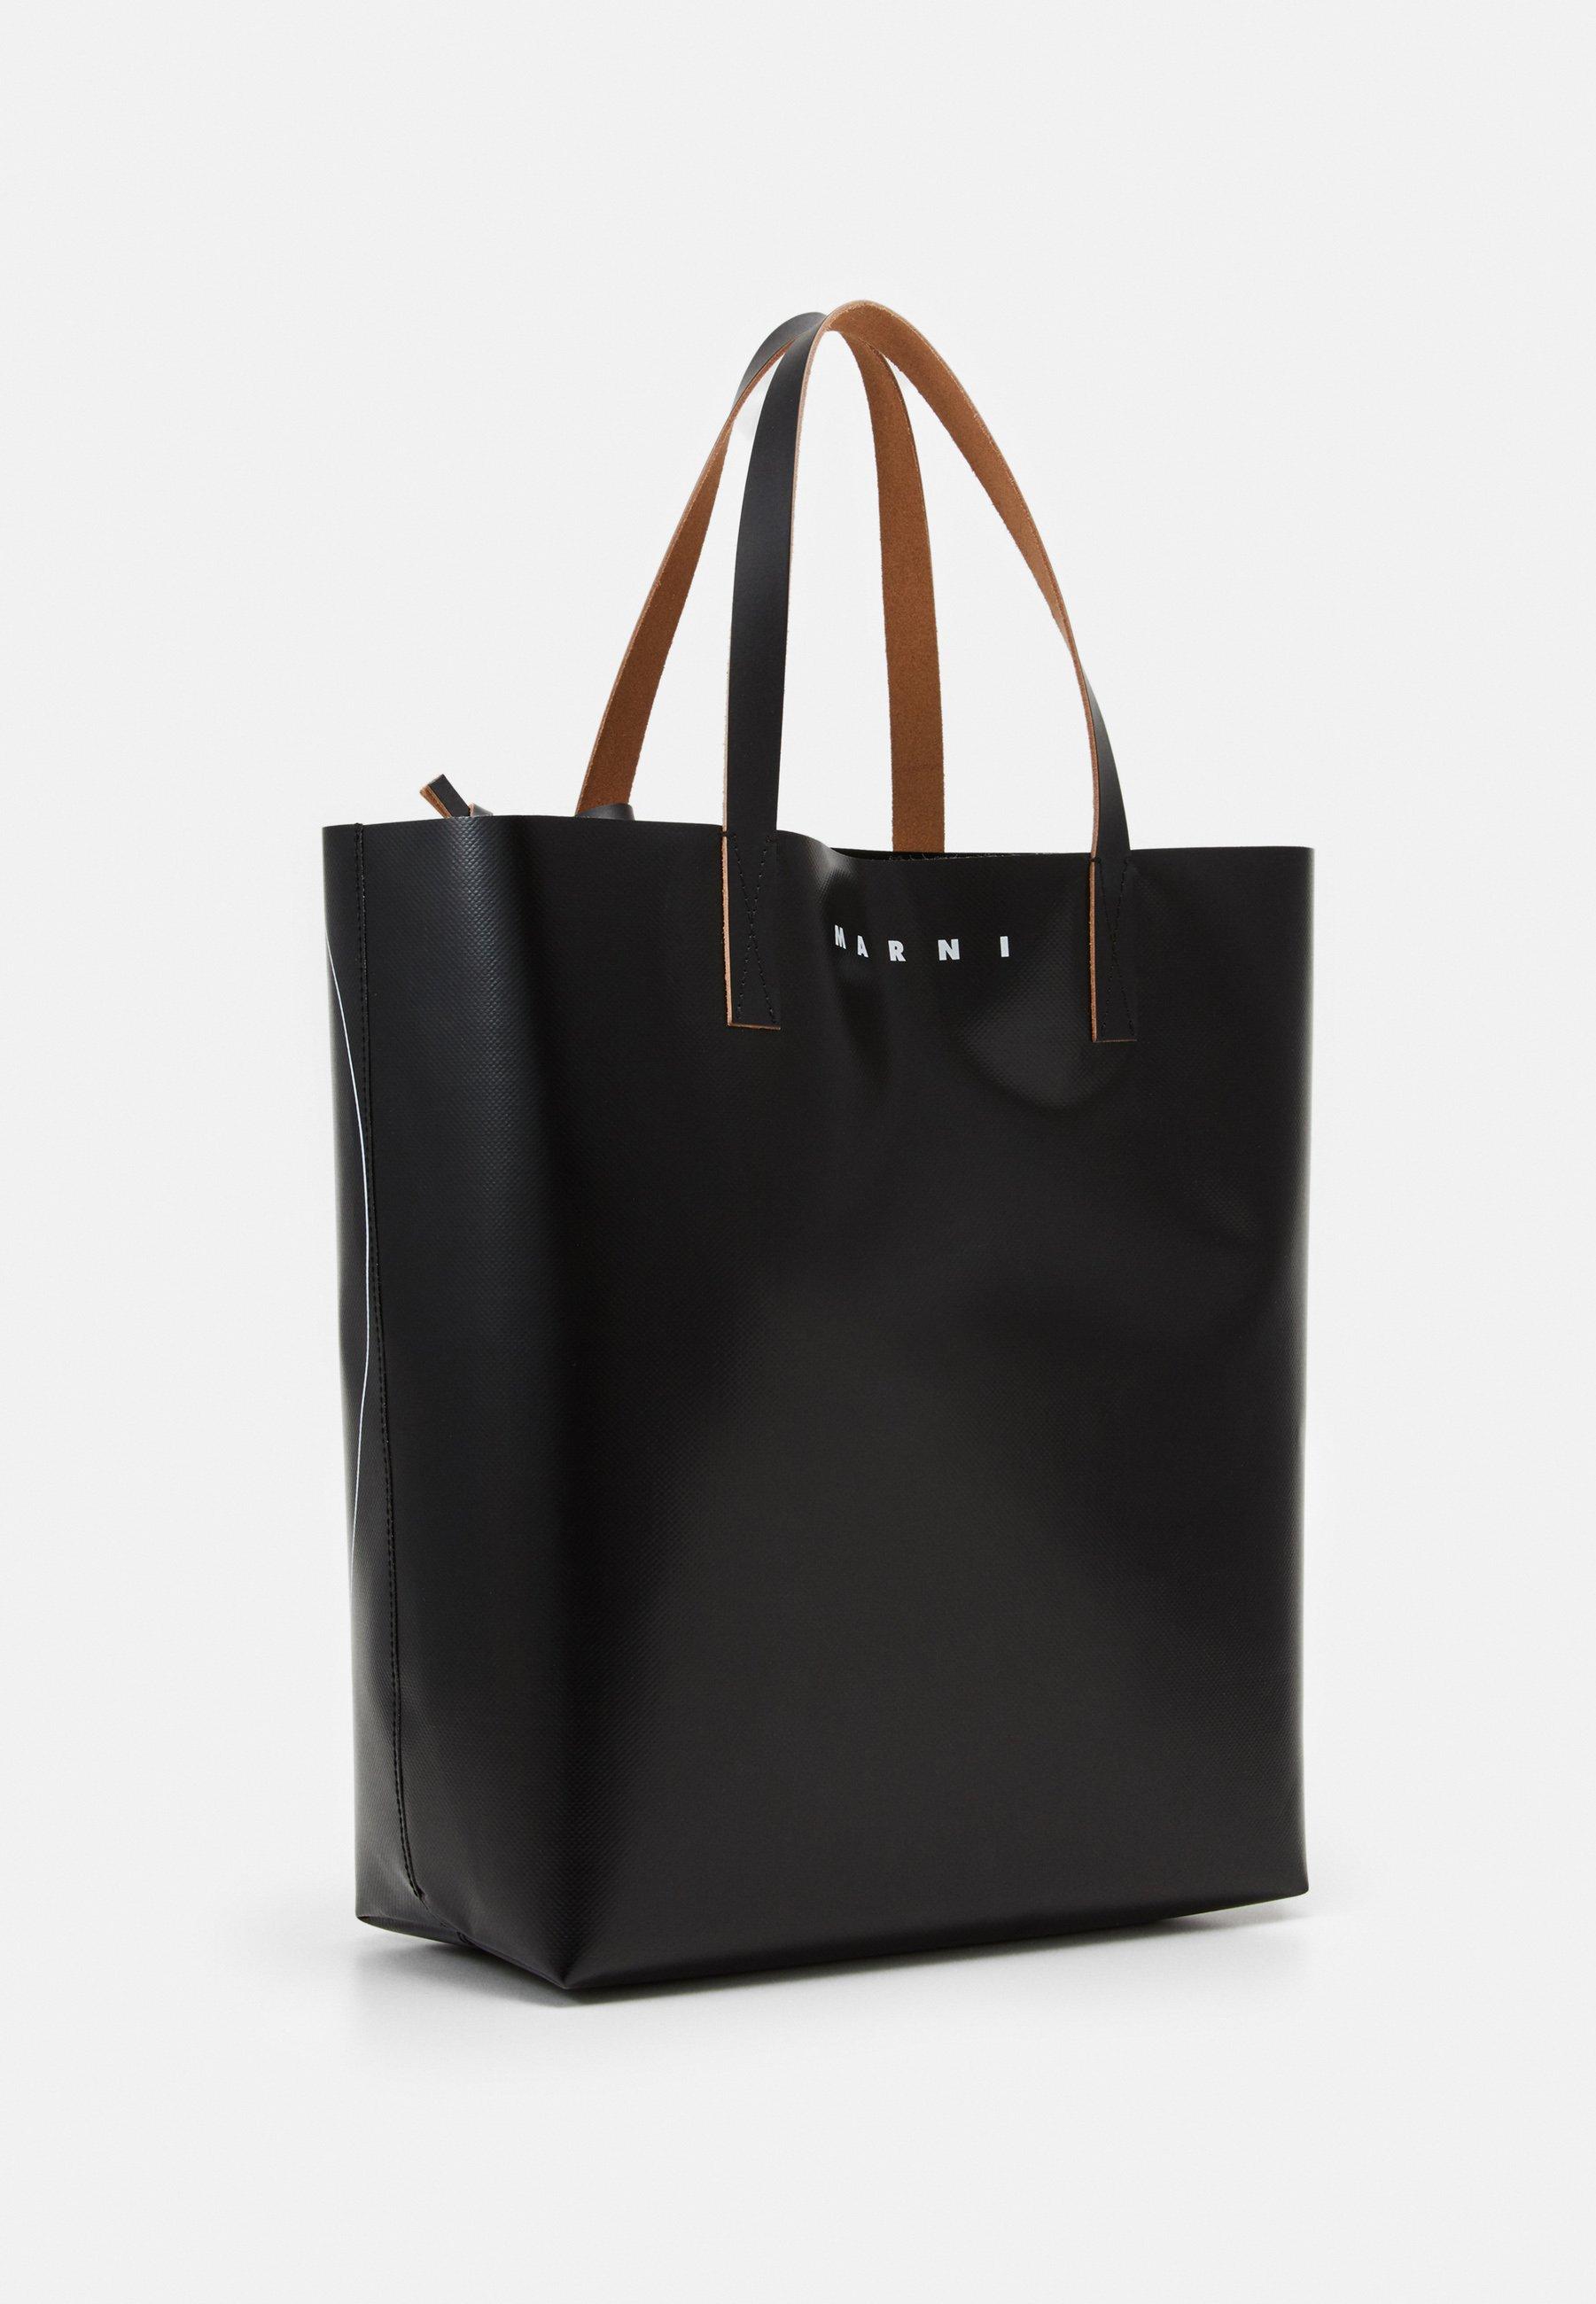 Marni Shoppingveske - black/svart uStcMzeHW2JVs39